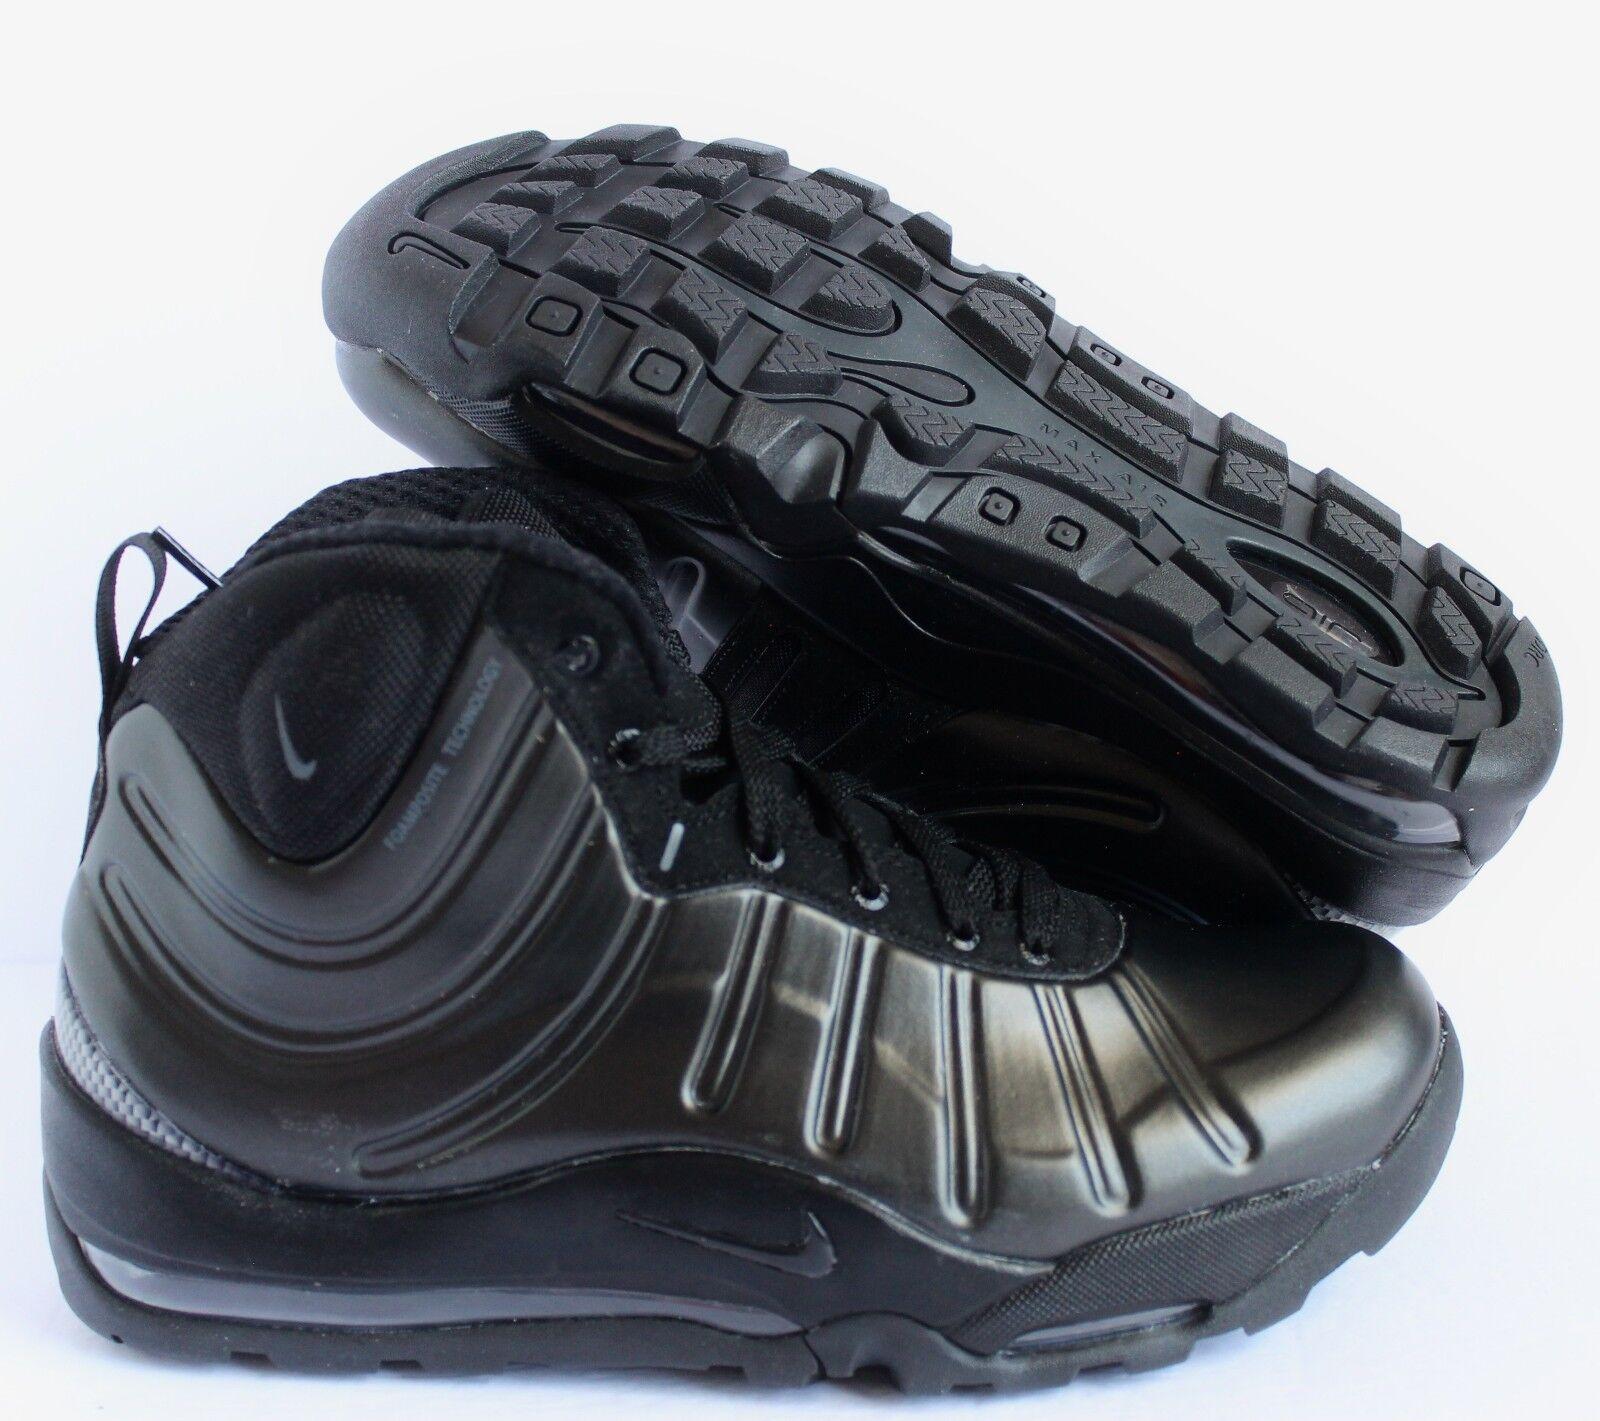 NIKE AIR BAKIN POSITE BOOT BLACK ANTHRACITE BLACK BLACK SZ 7 [618056 001]